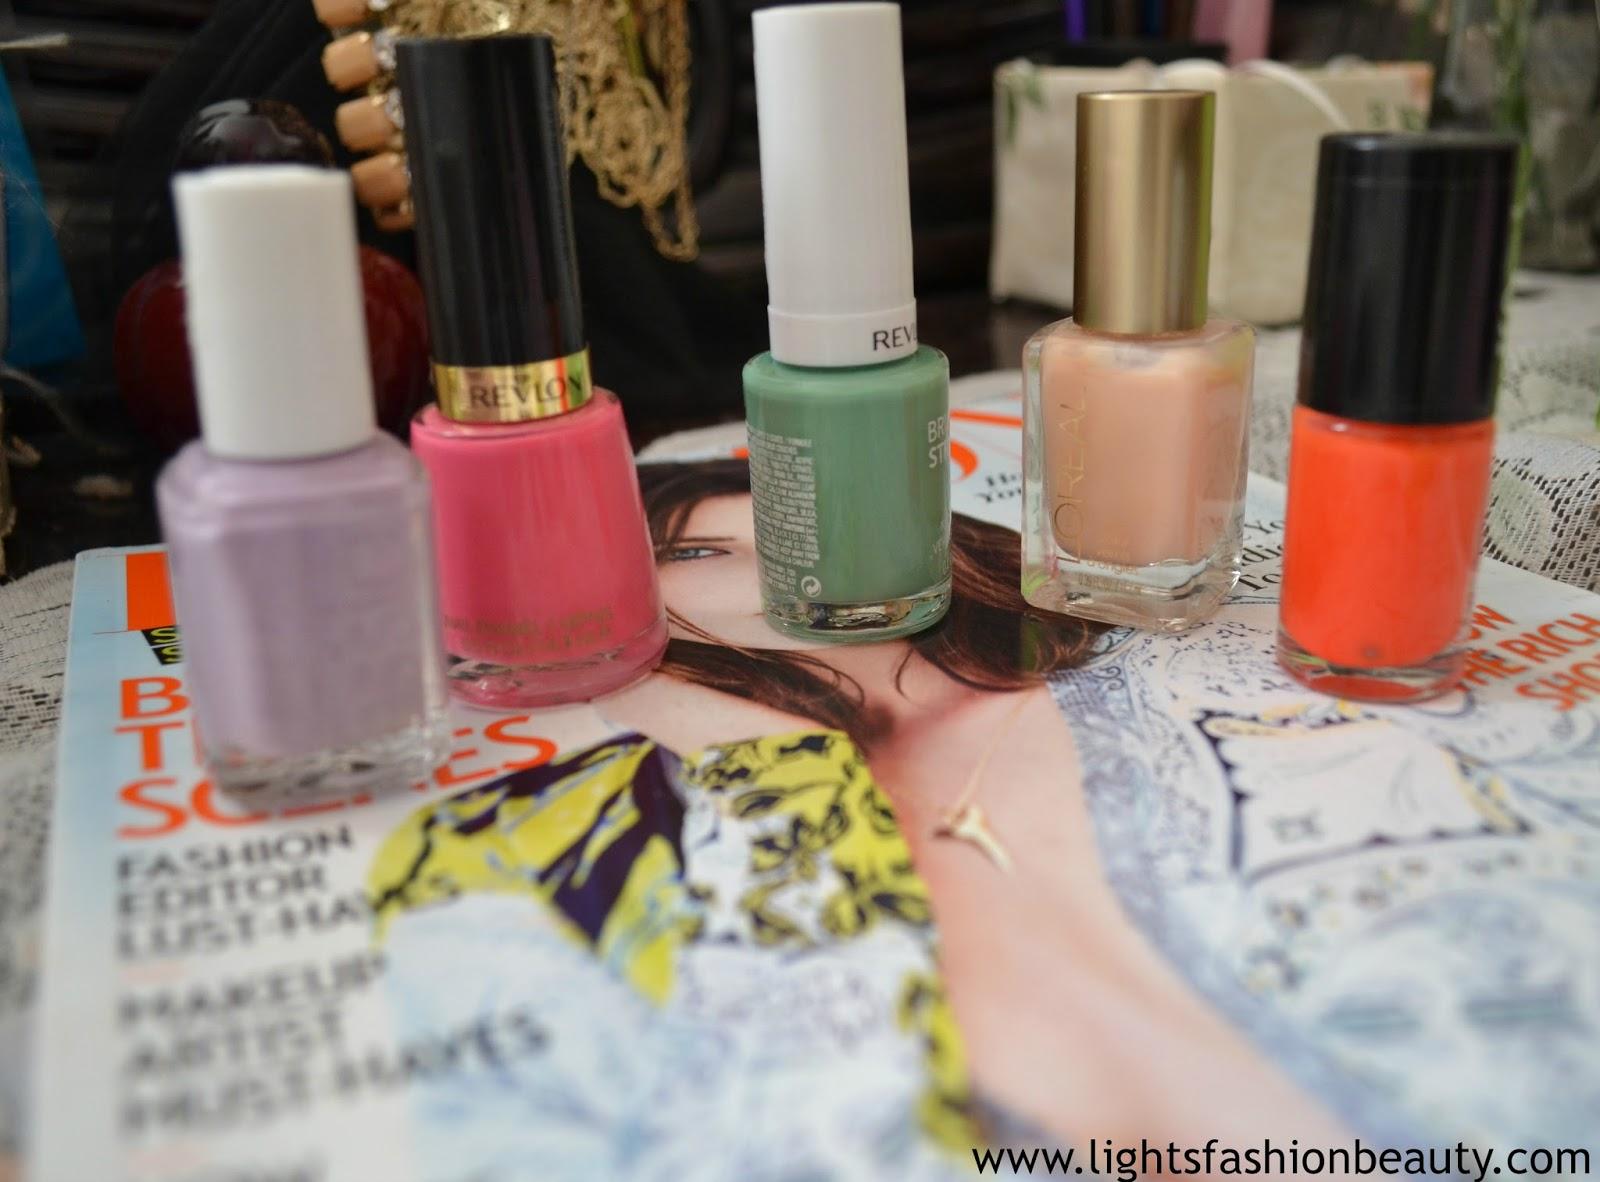 Spring Nail Polish, Maybelline, L'oreal, Essie, Maybelline, Revlon